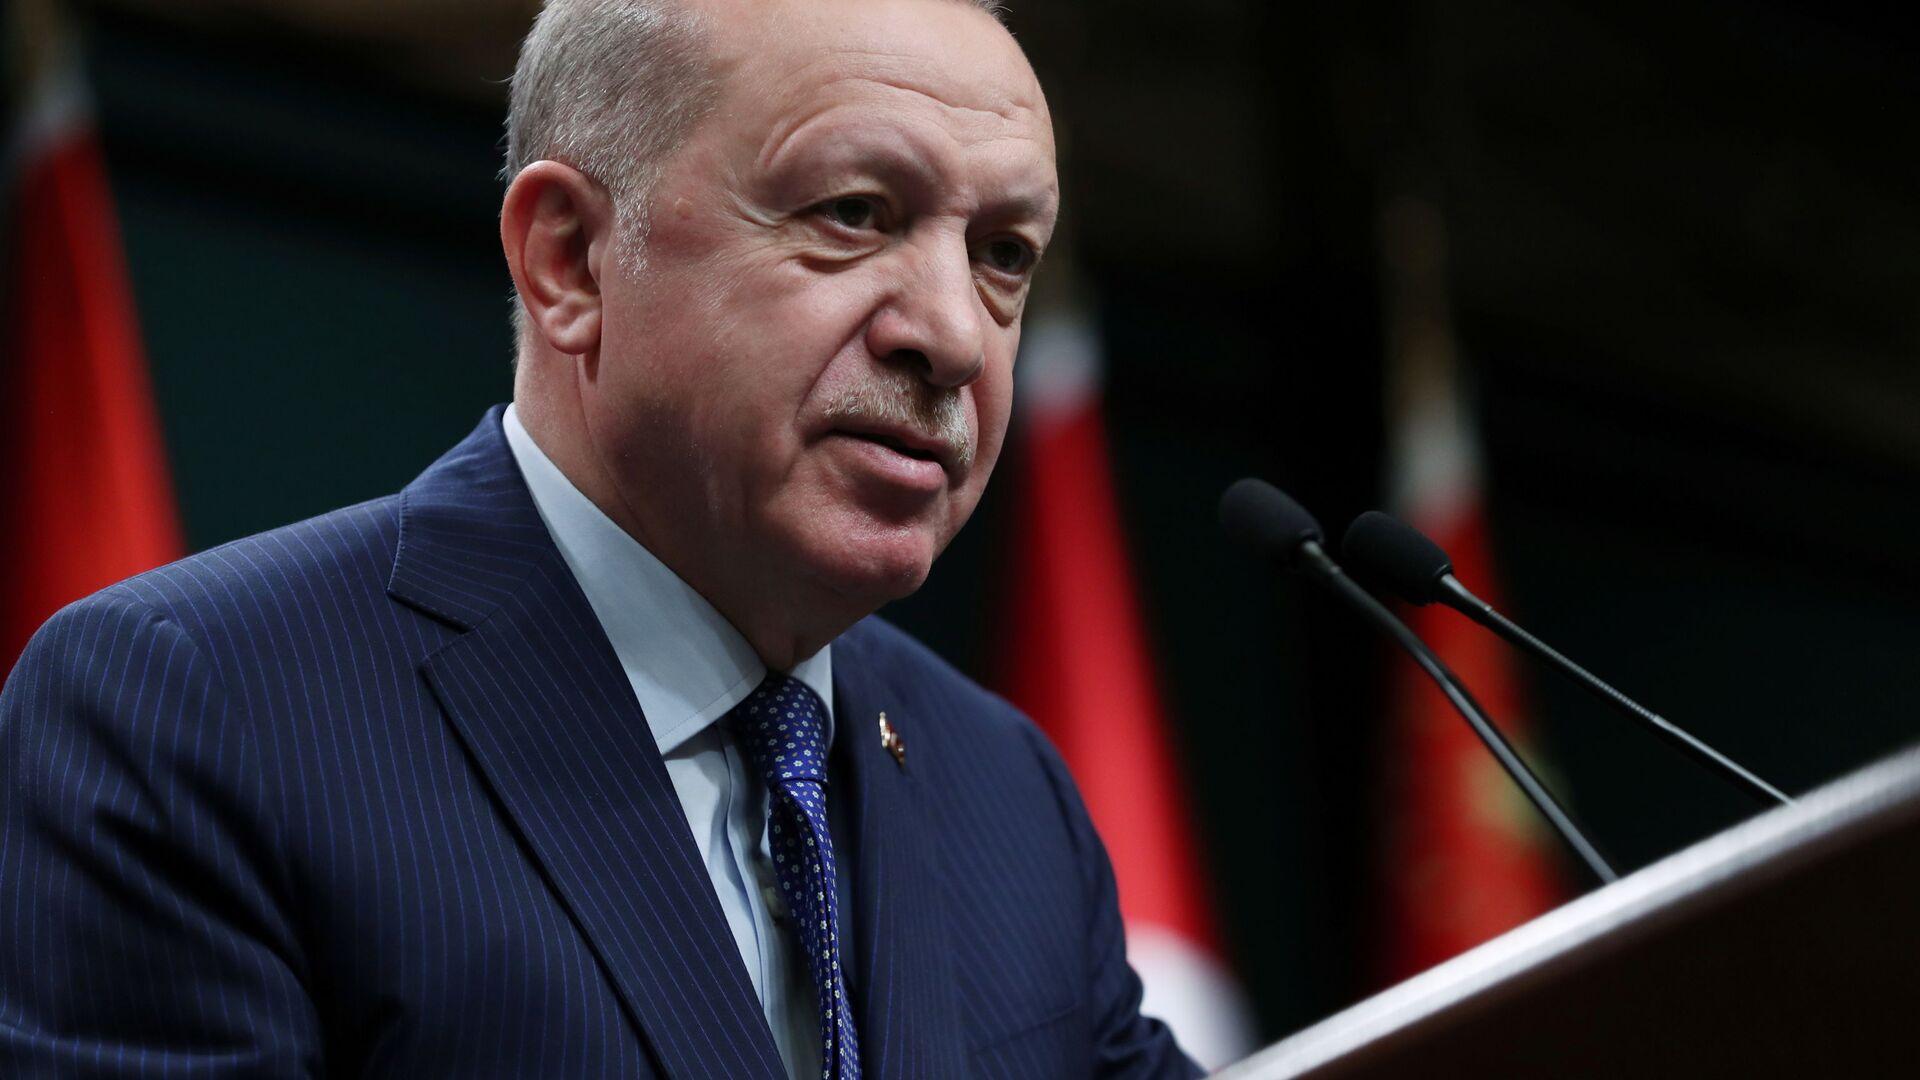 Il presidente turco Recep Tayyip Erdogan  - Sputnik Italia, 1920, 11.10.2021